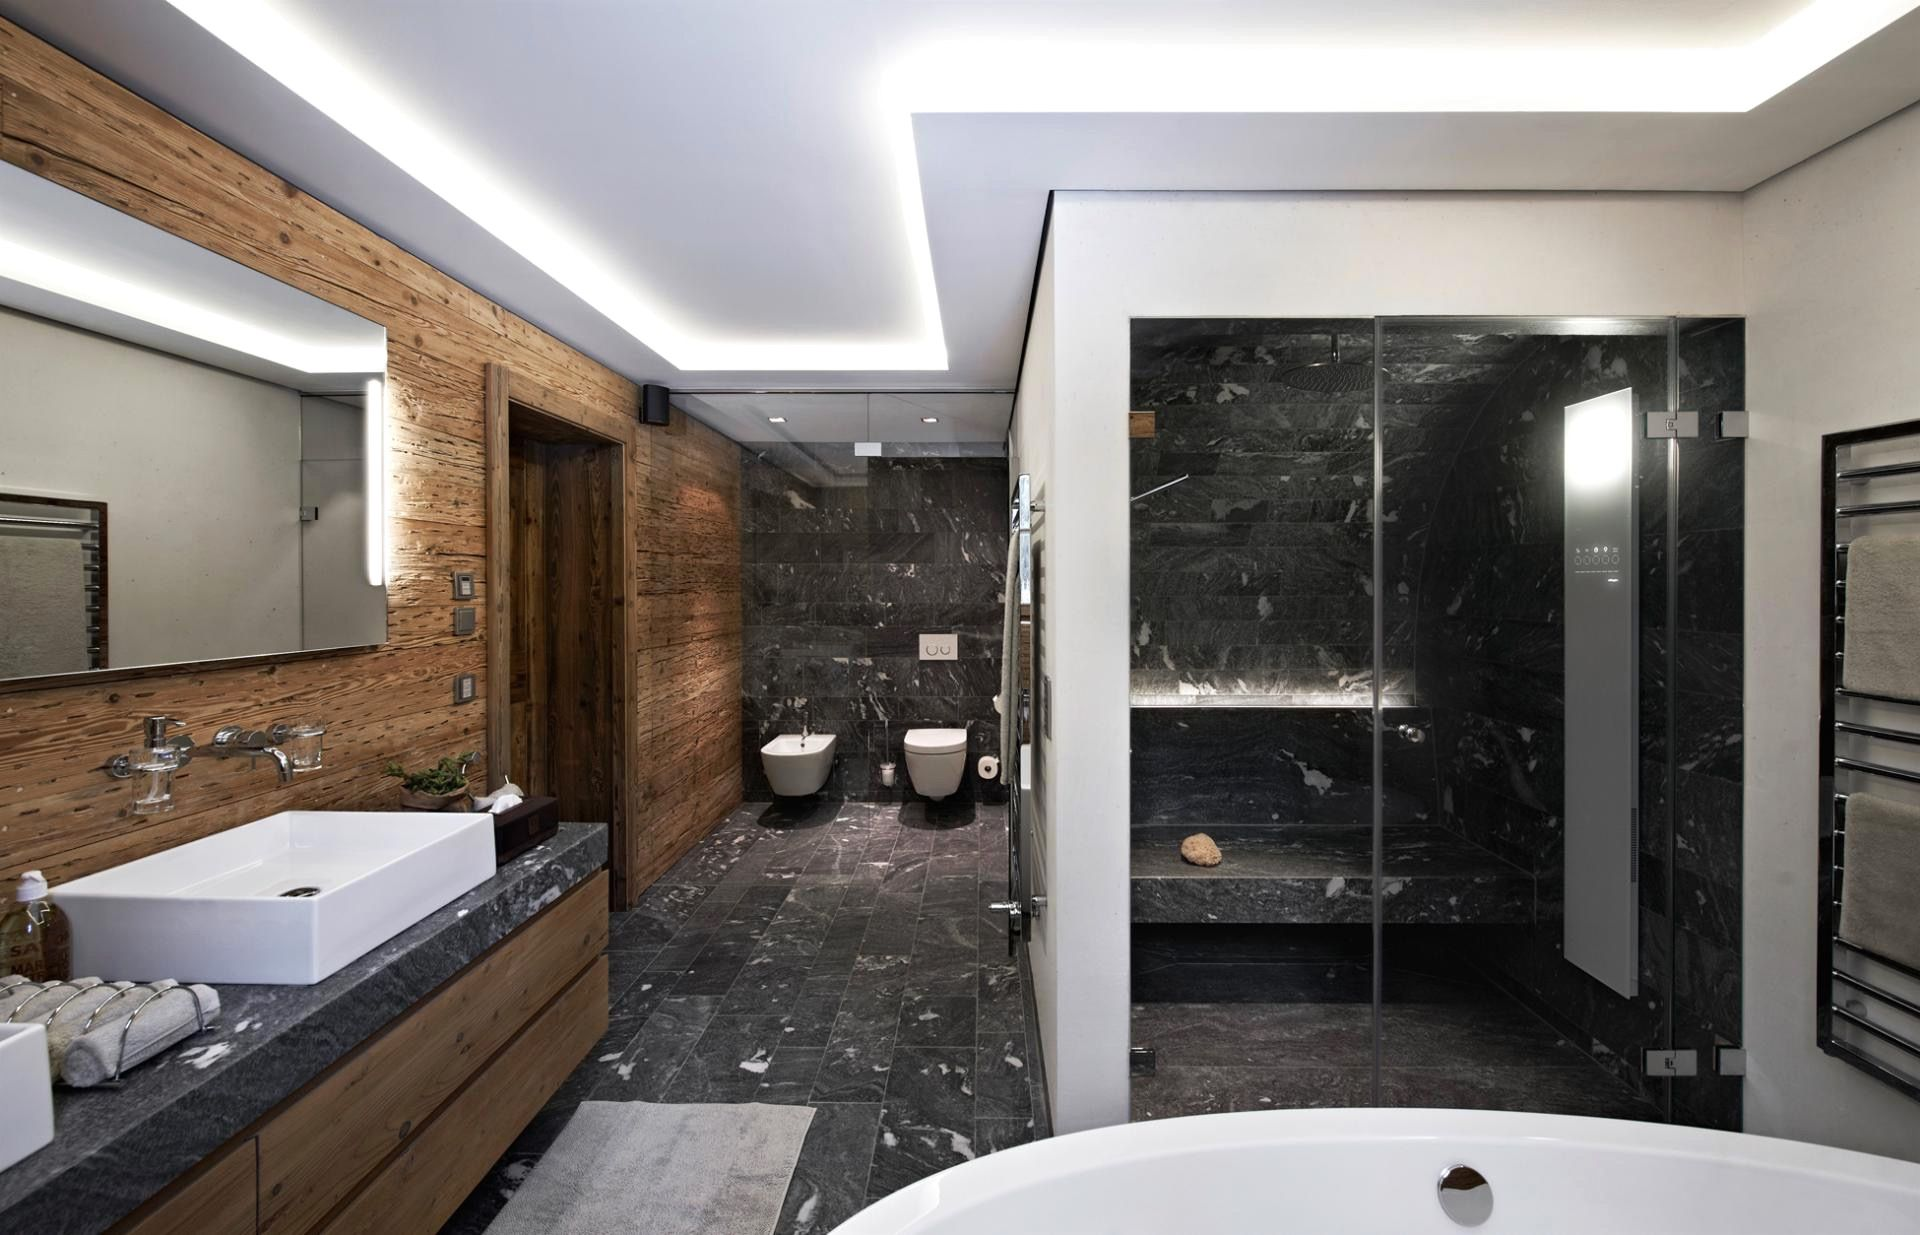 Modernes Badezimmer Grau Moderne Deko Ideen